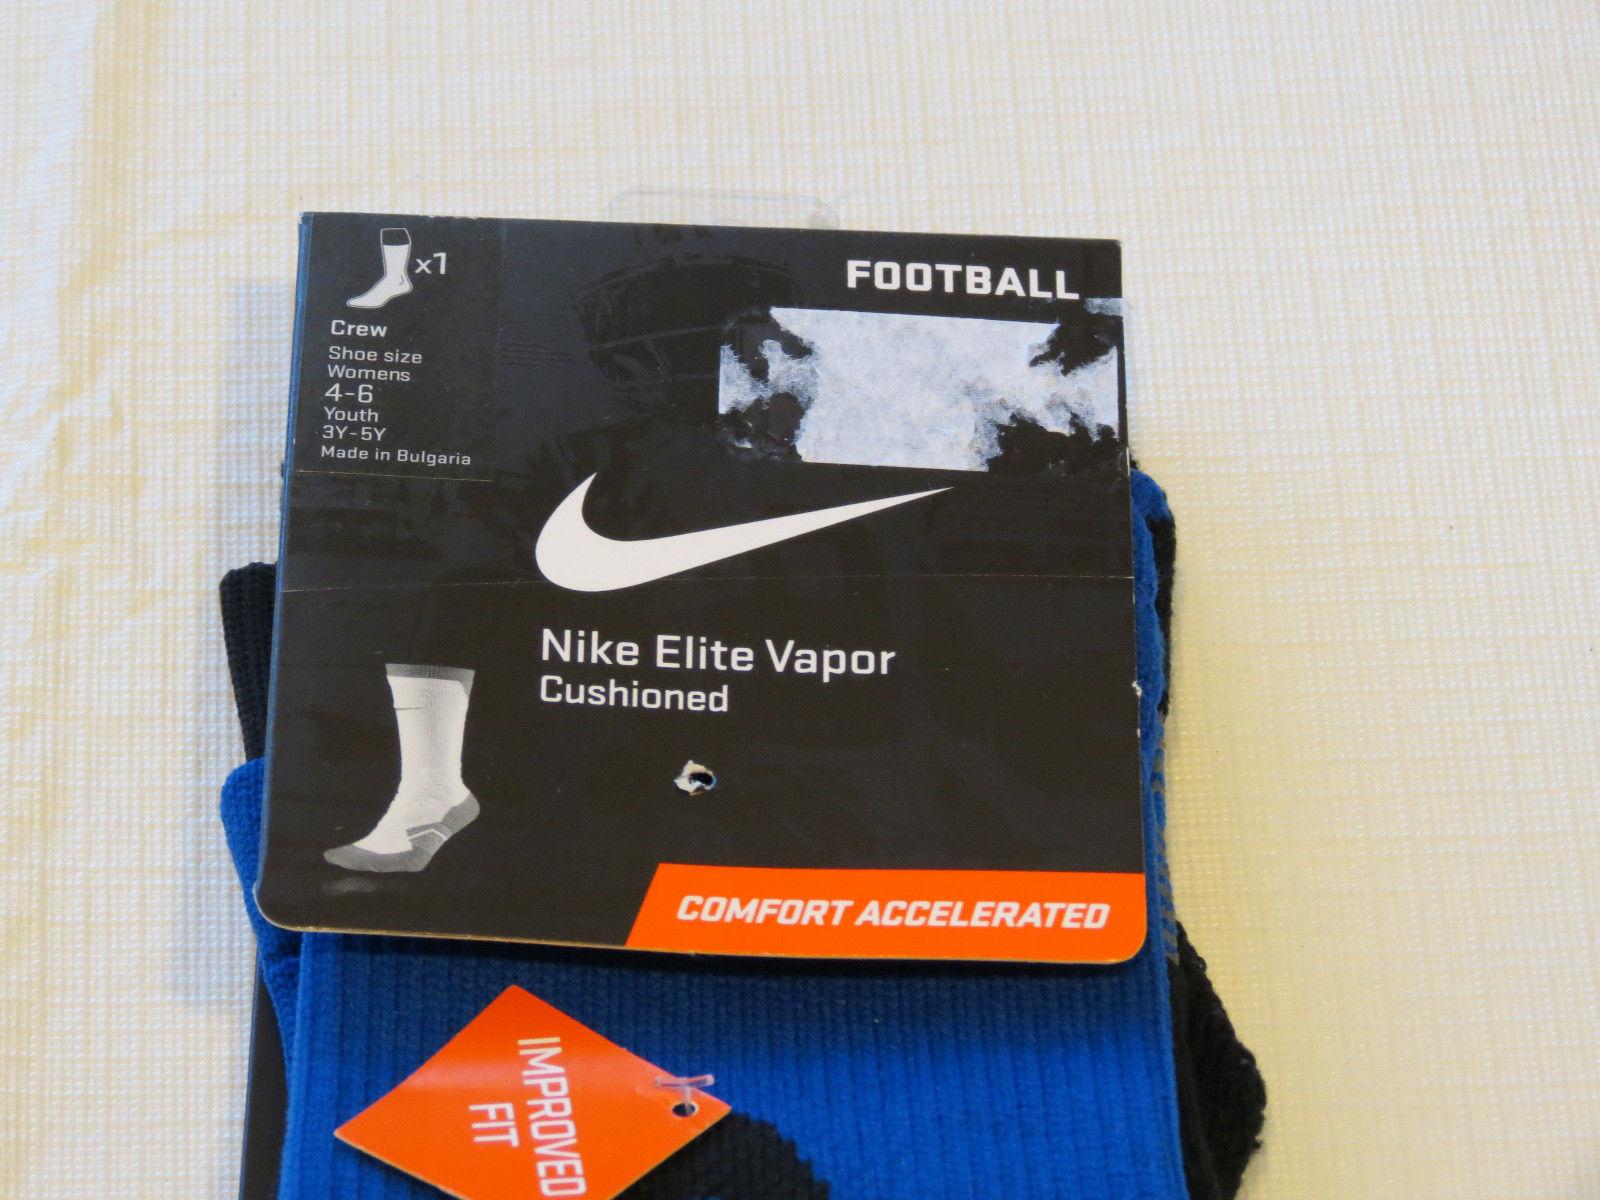 Nike womens S 4-6 Elite Vapor Cushioned Football Socks Comfort Accelerated NWT*^